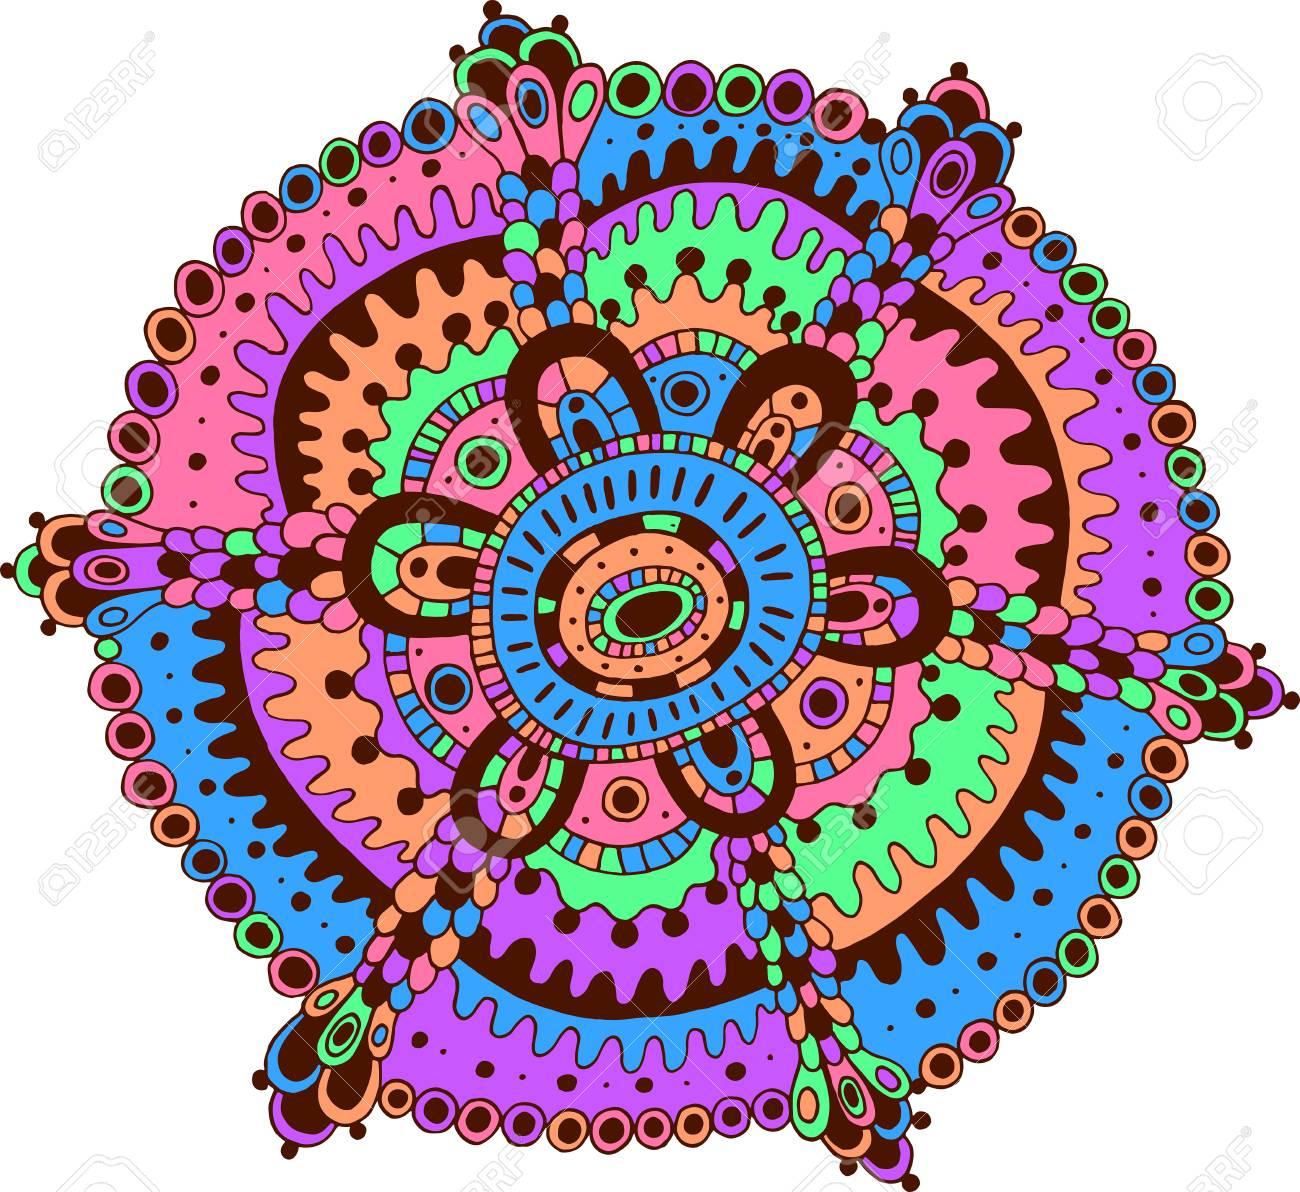 Doodle Mandala Art Cartoon Relax And Meditative Psychedelic